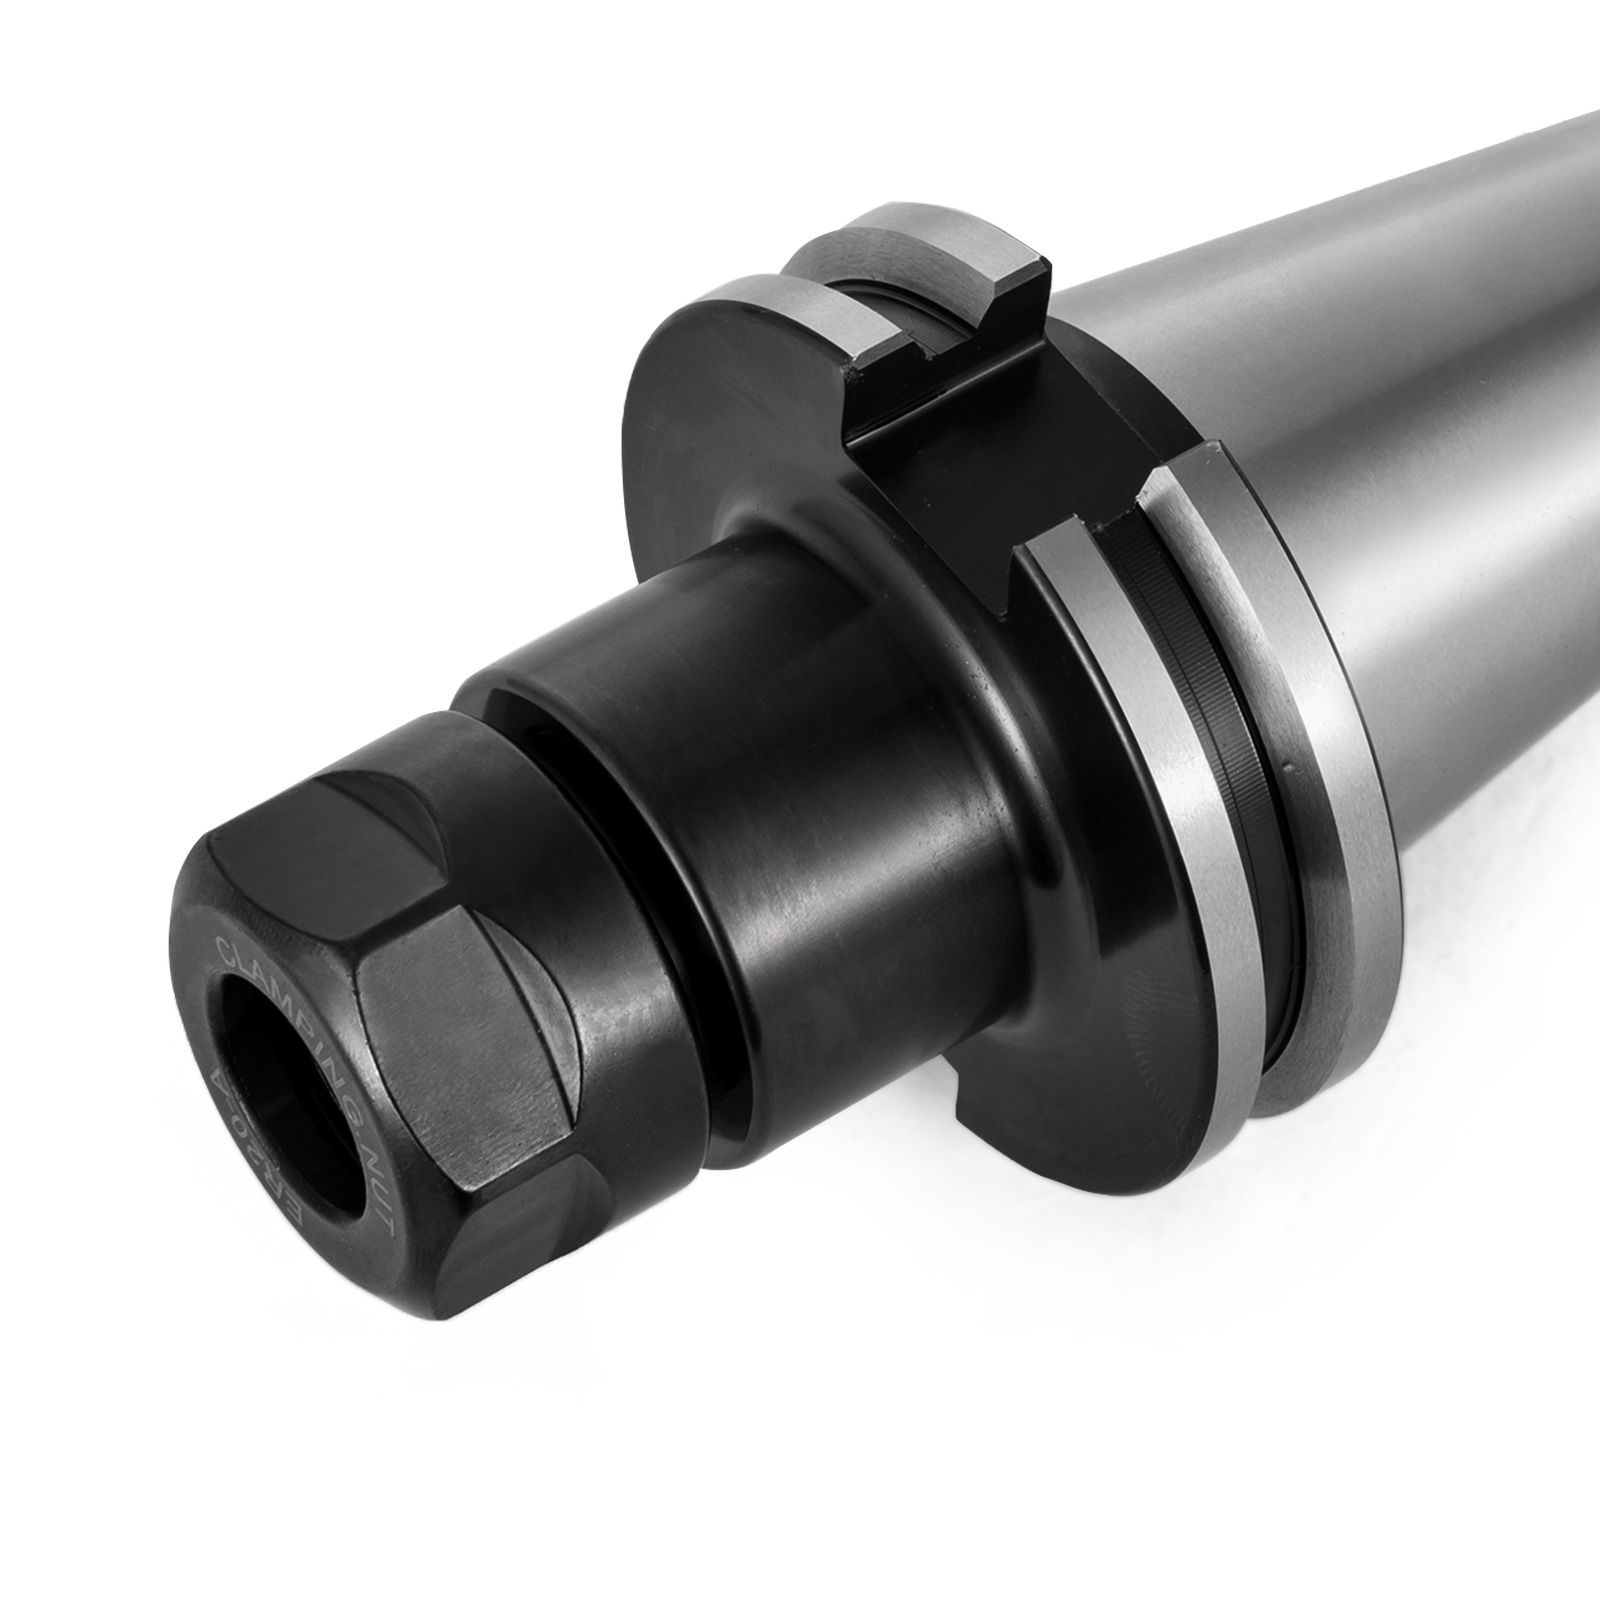 5PC CAT40 ER20 COLLET CHUCKS 2.75 Precision Holder 20K RPM Good Milling Tested